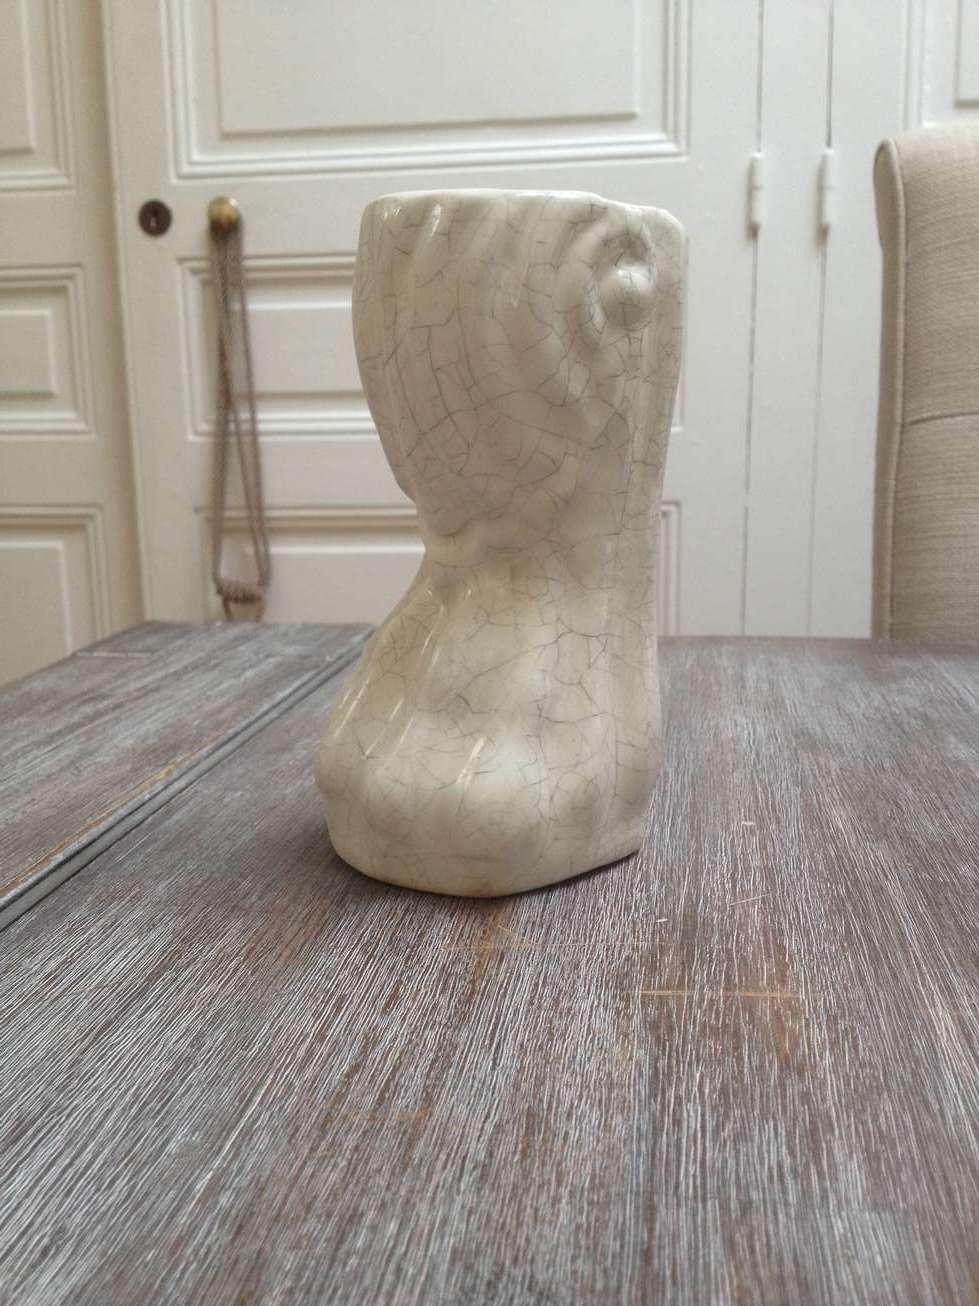 creation-pied-poele-fonte-patte-lion-resine-illusion-art-restaurarte.jpg